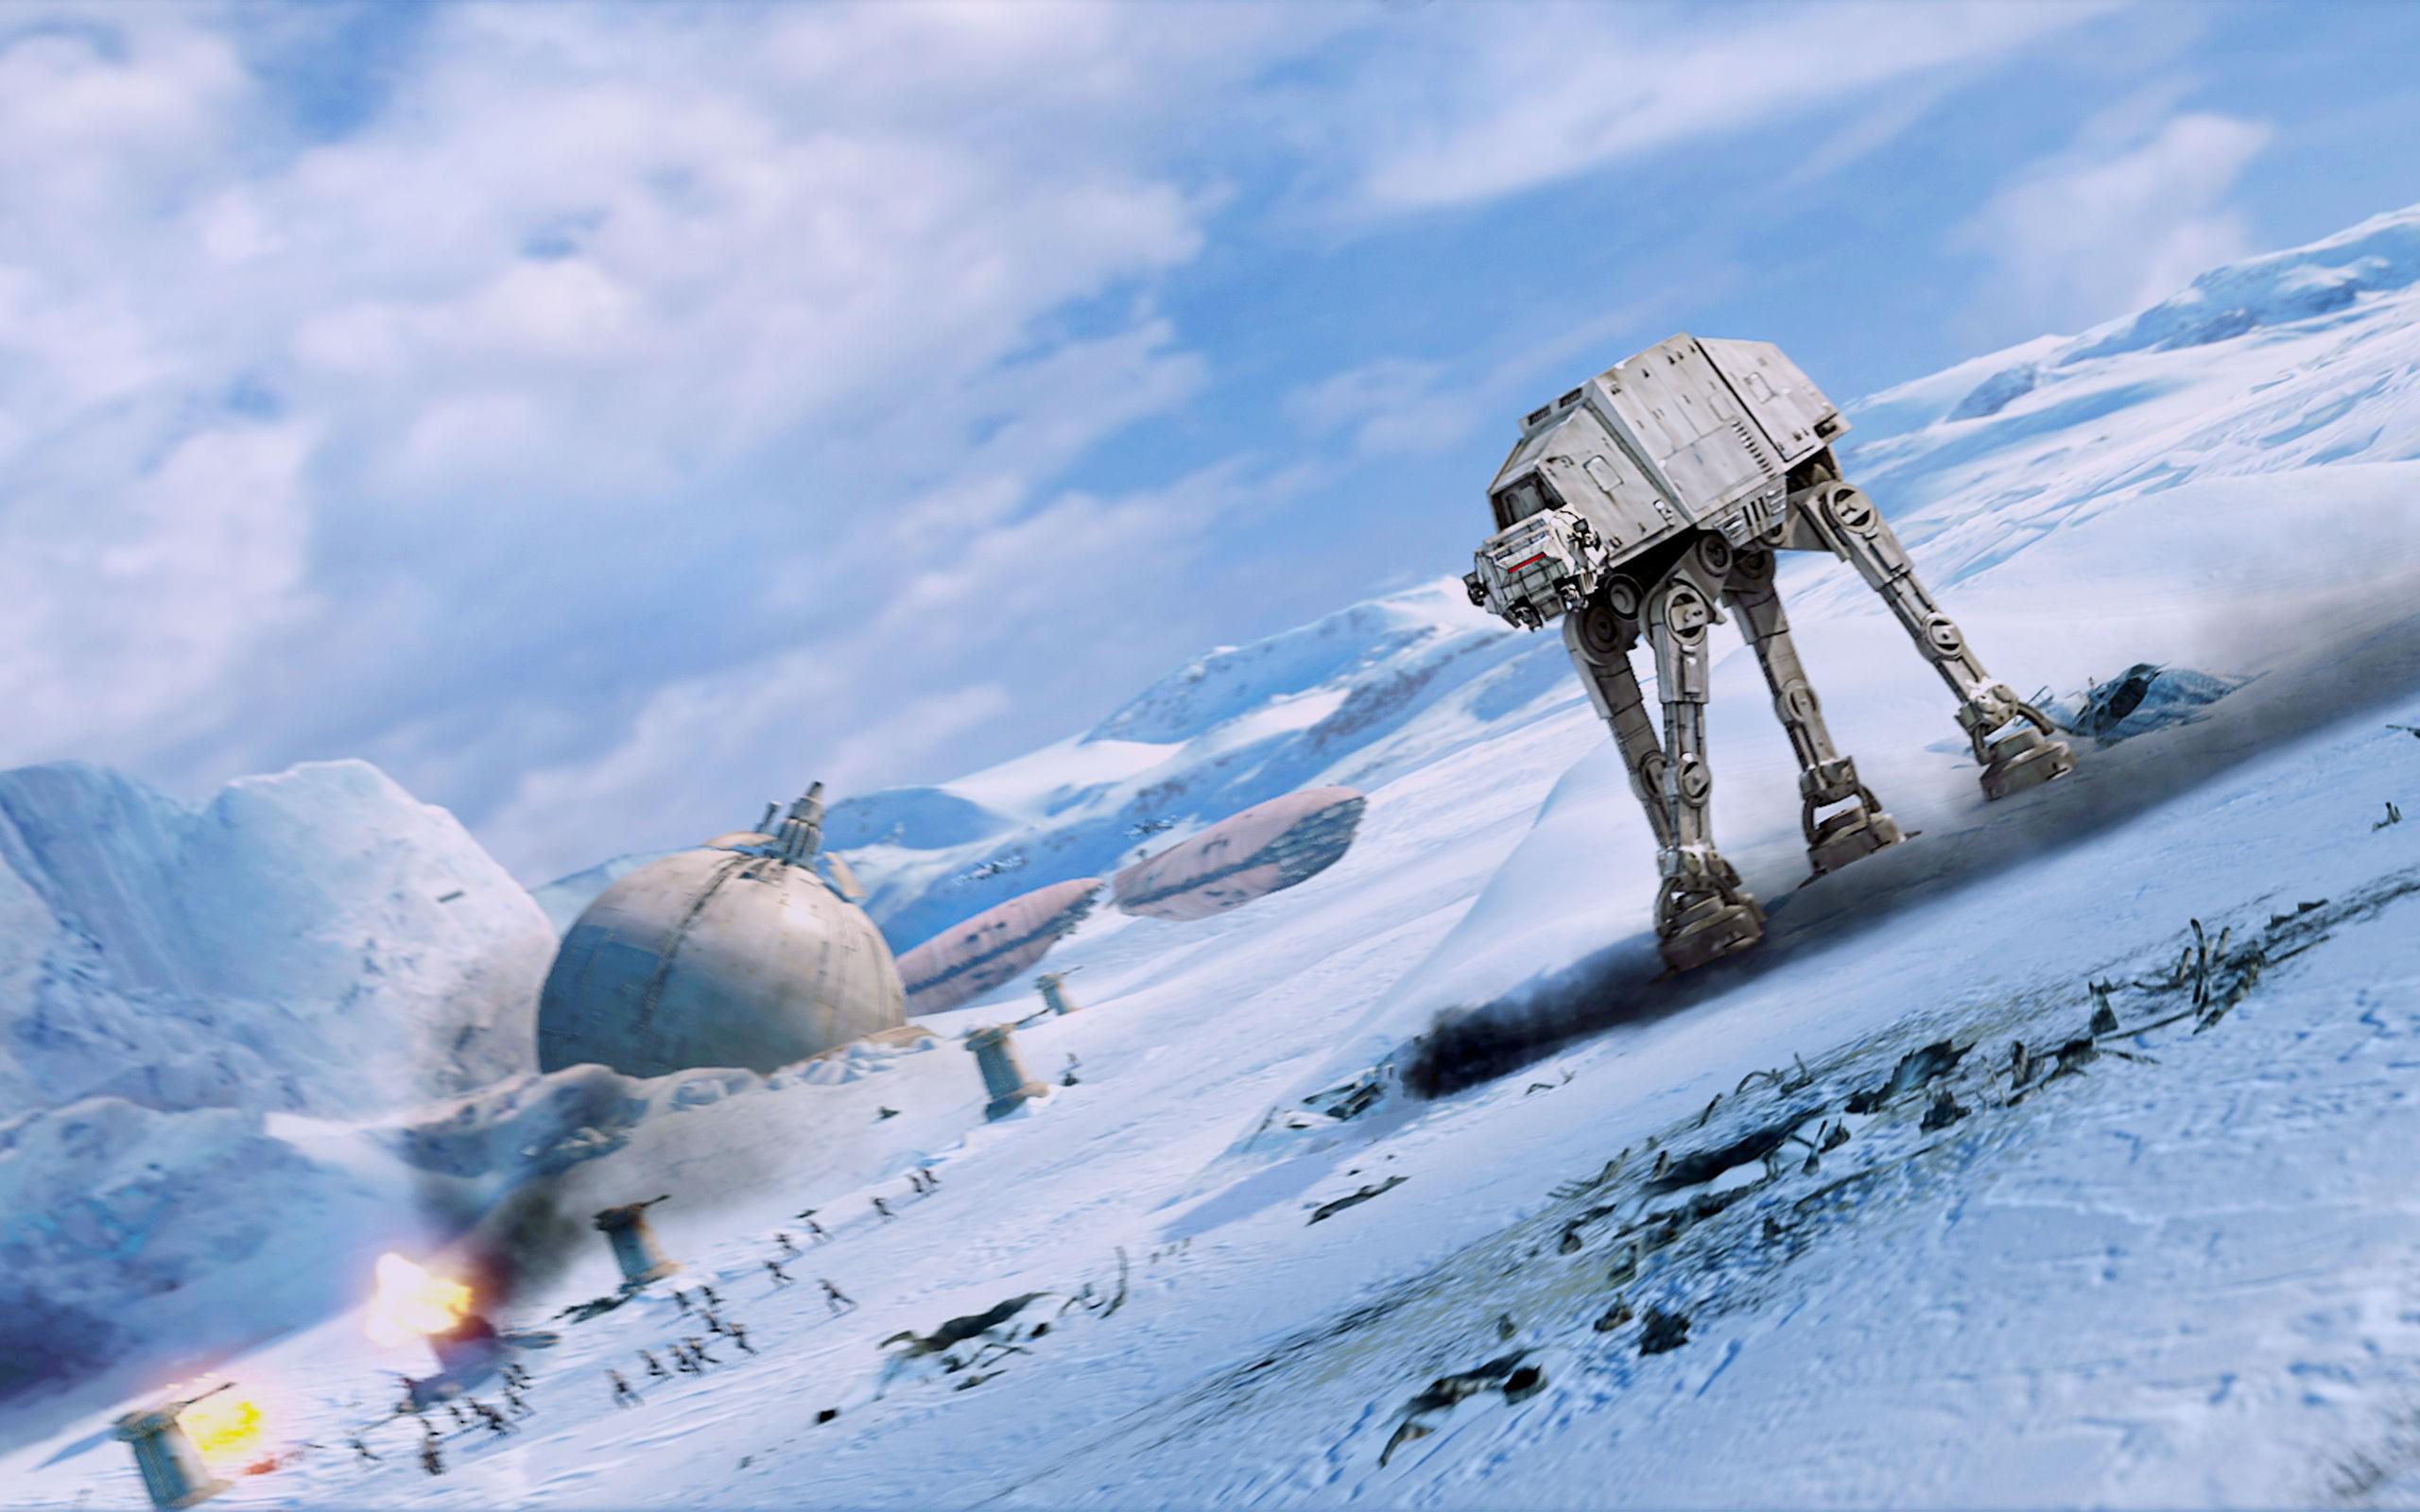 Free Download Star Wars Hoth At At The Empire Strikes Back